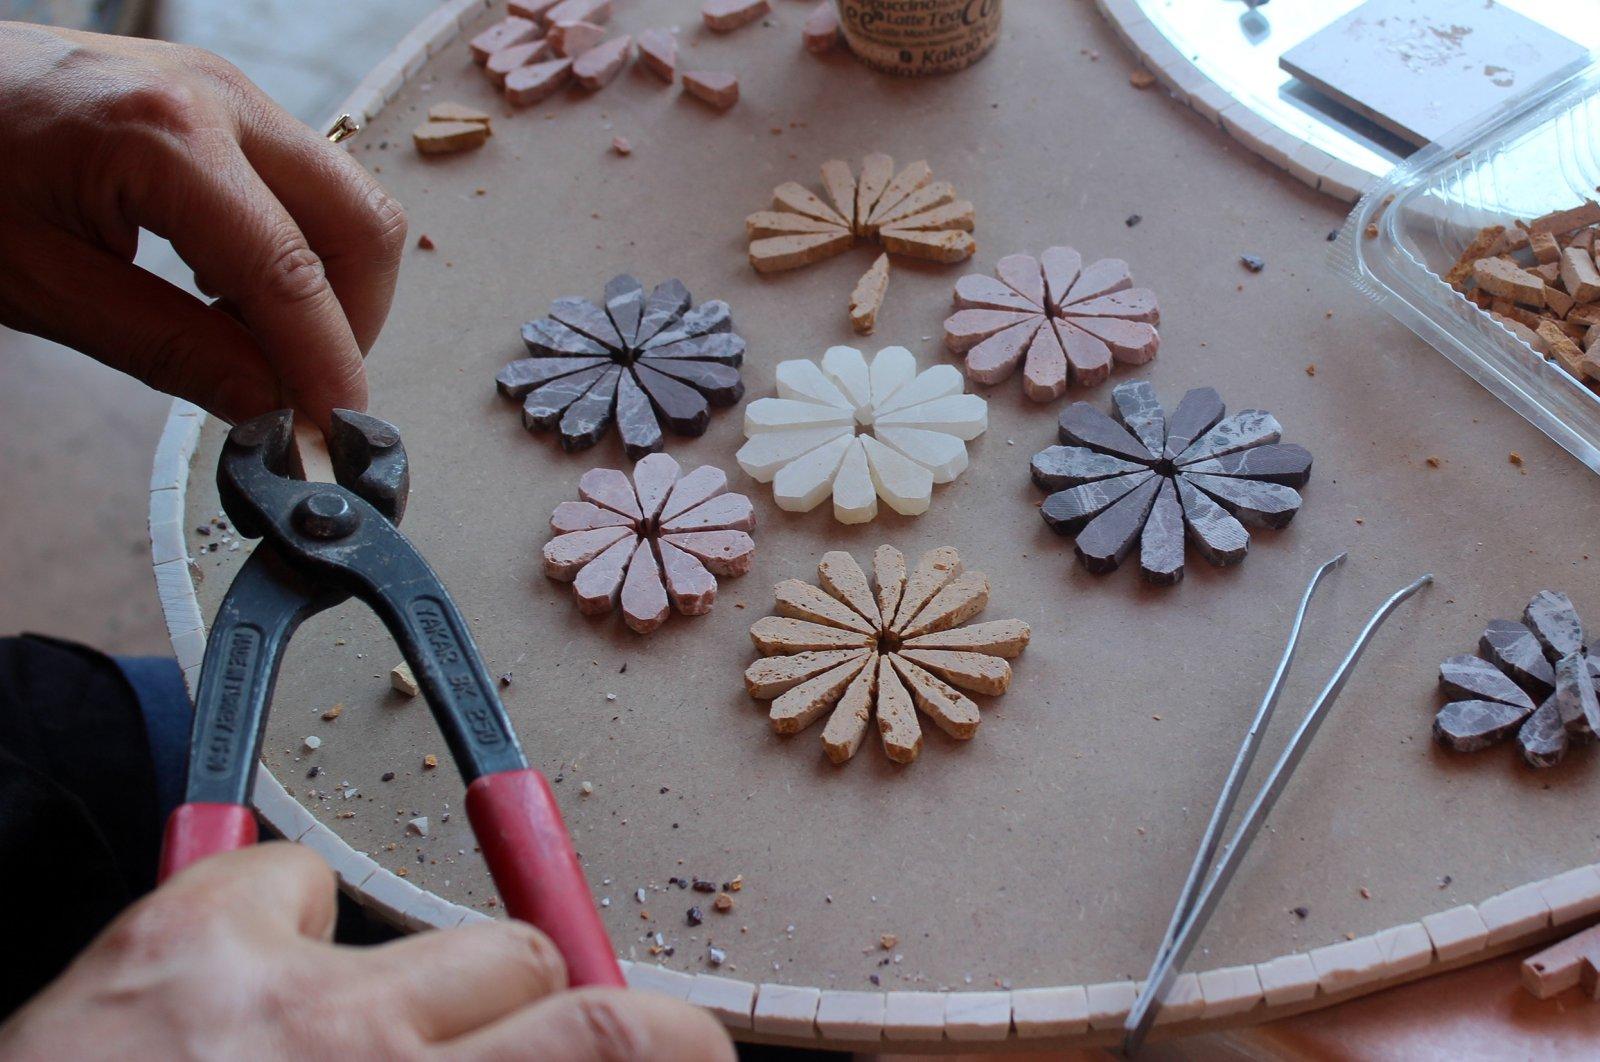 Mosaic masters make great efforts to produce mosaic souvenirs for EXPO visitors. (İHA PHOTO)